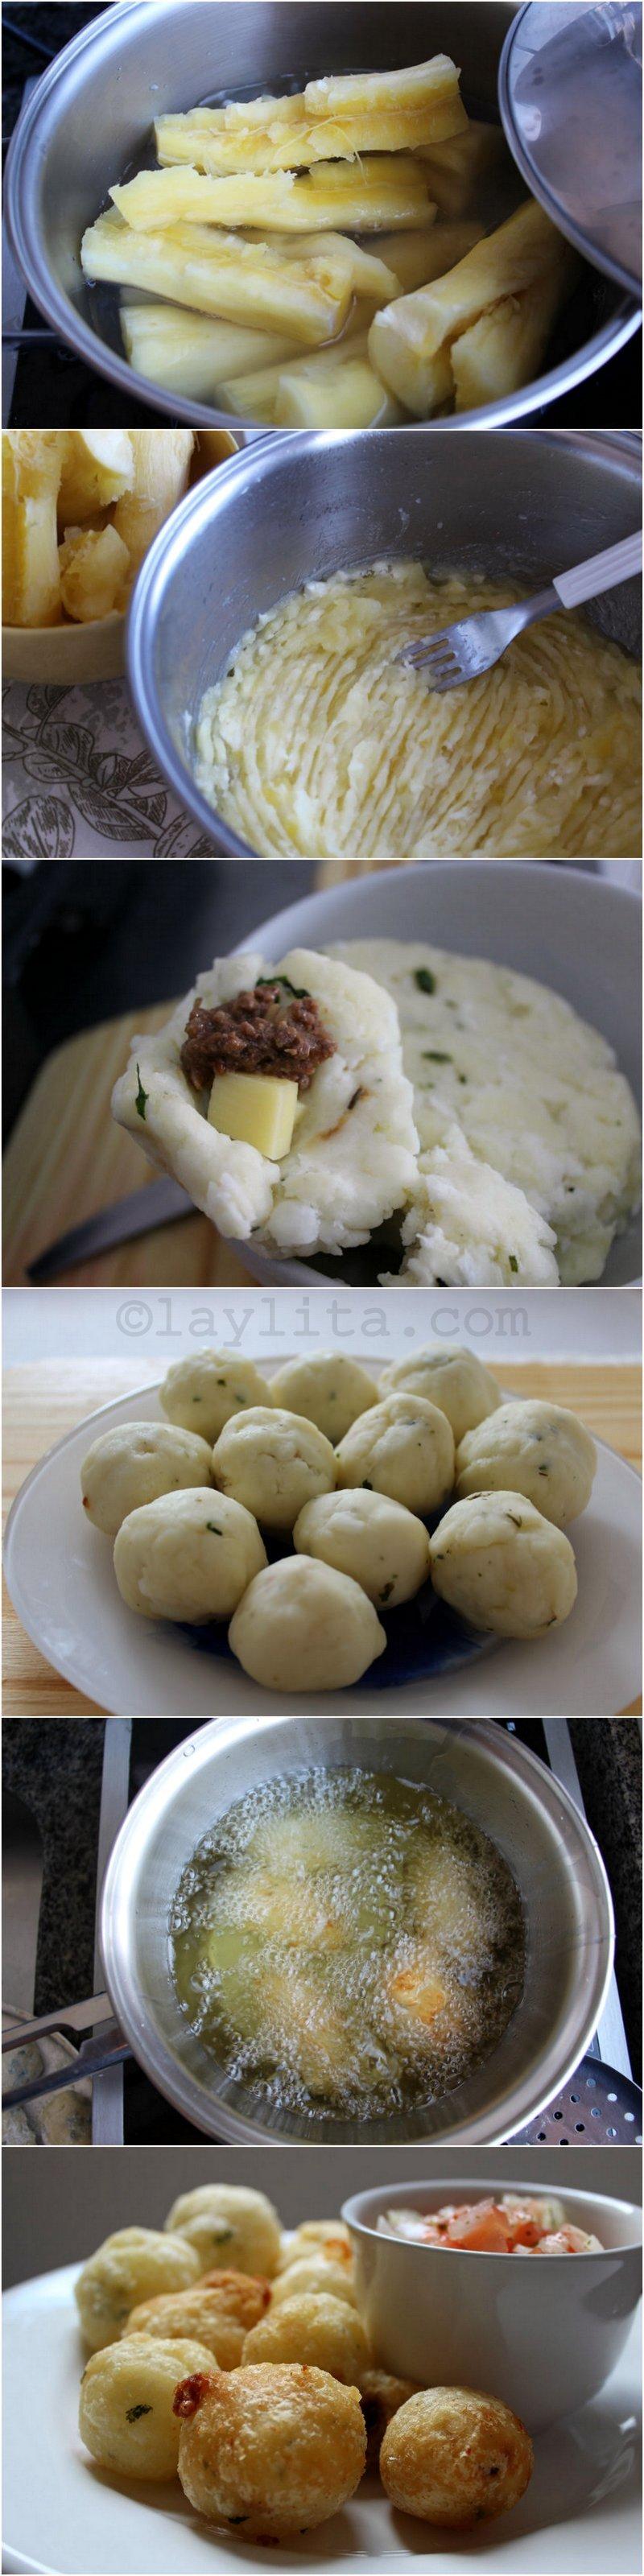 How to make Brazilian manioc or cassava balls stuffed with cheese - Bolinho de macaxeira